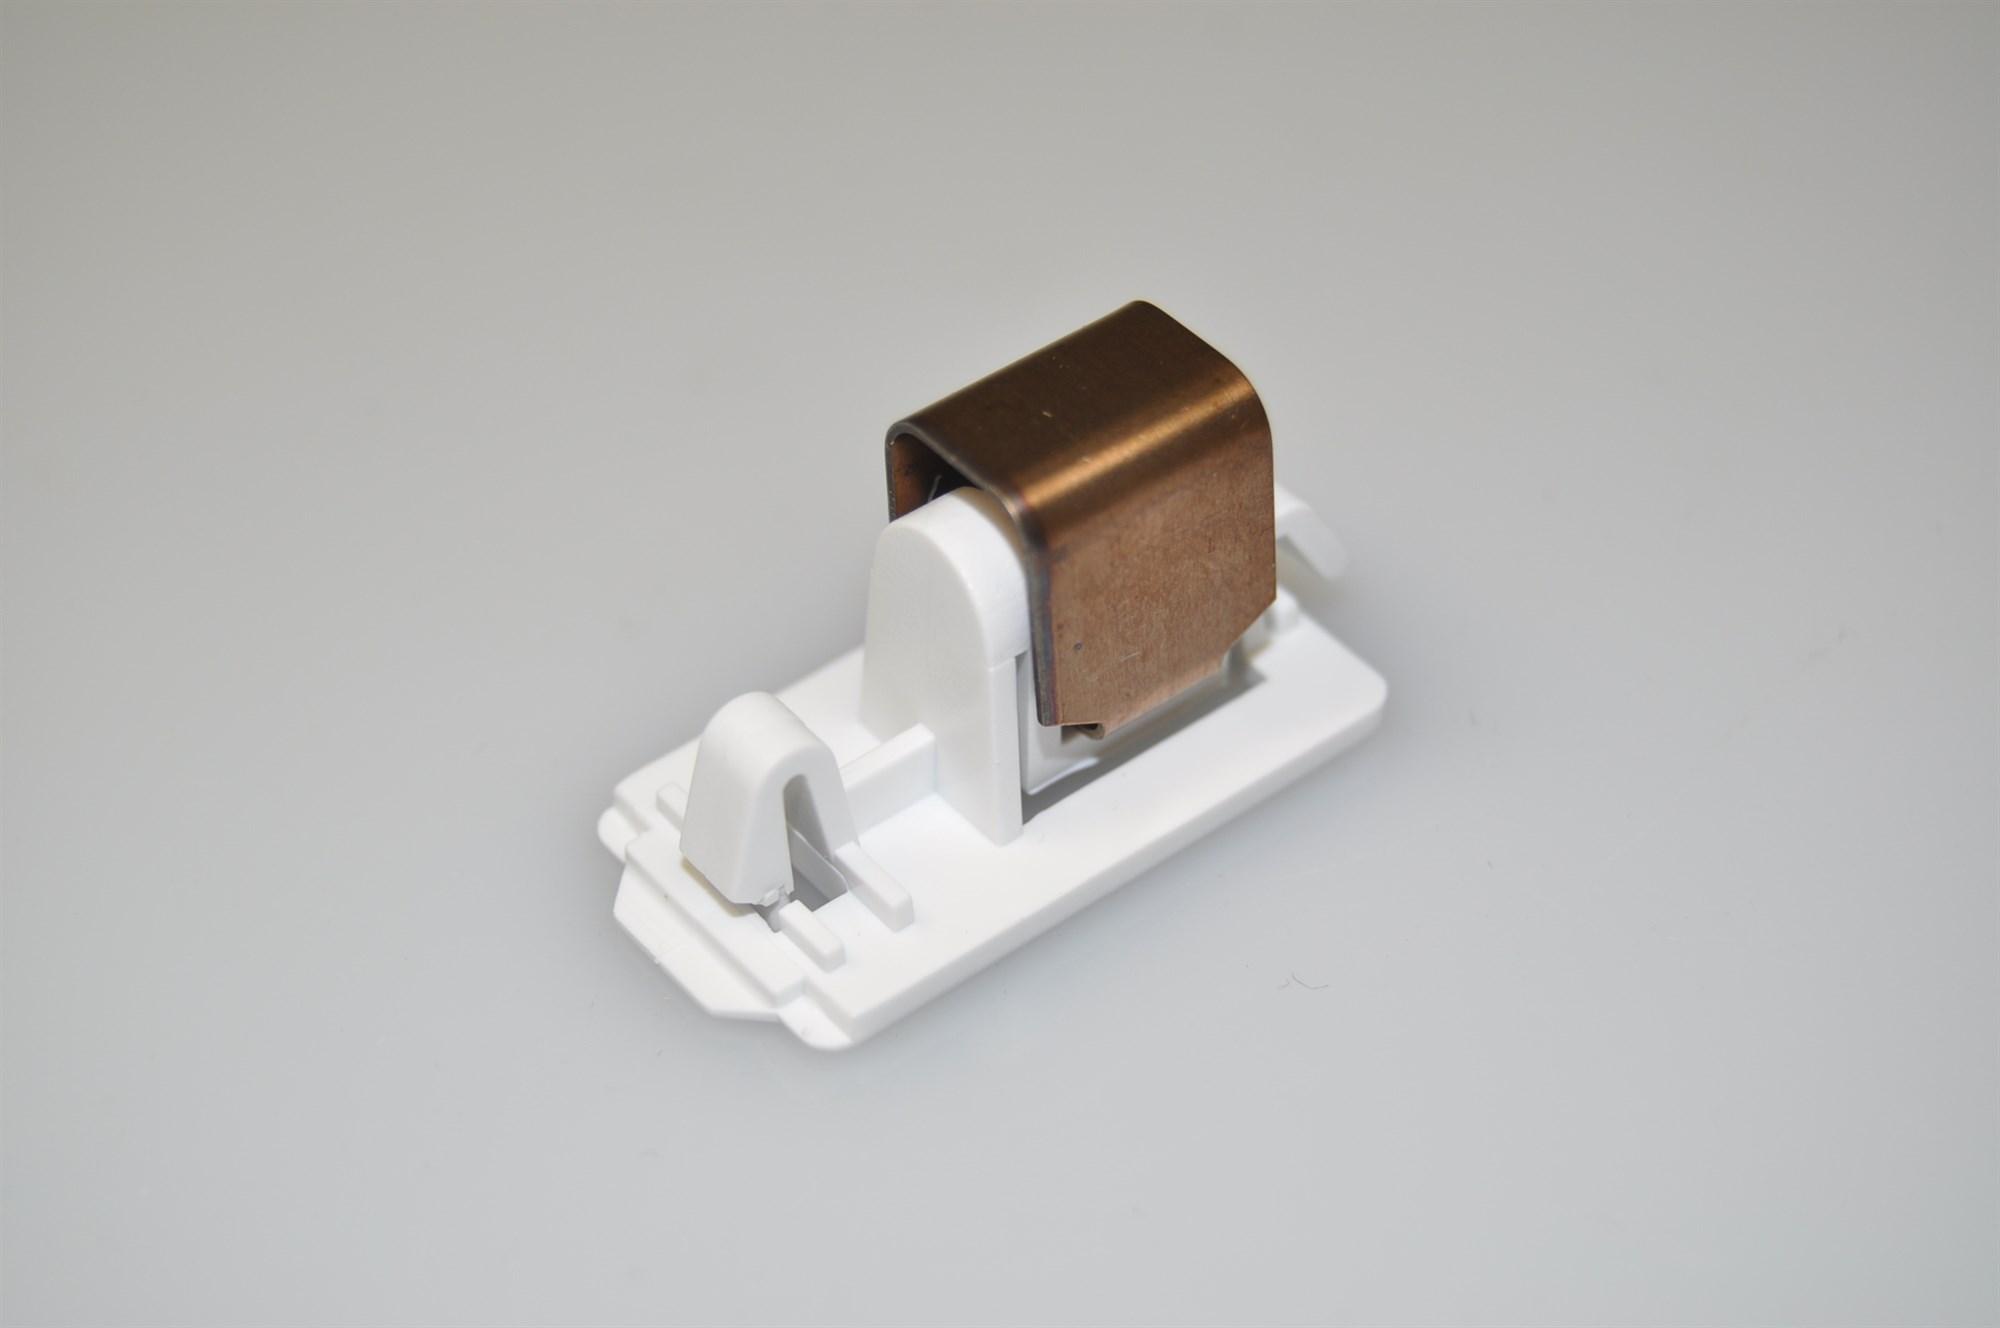 syst me de verrouillage whirlpool s che linge. Black Bedroom Furniture Sets. Home Design Ideas